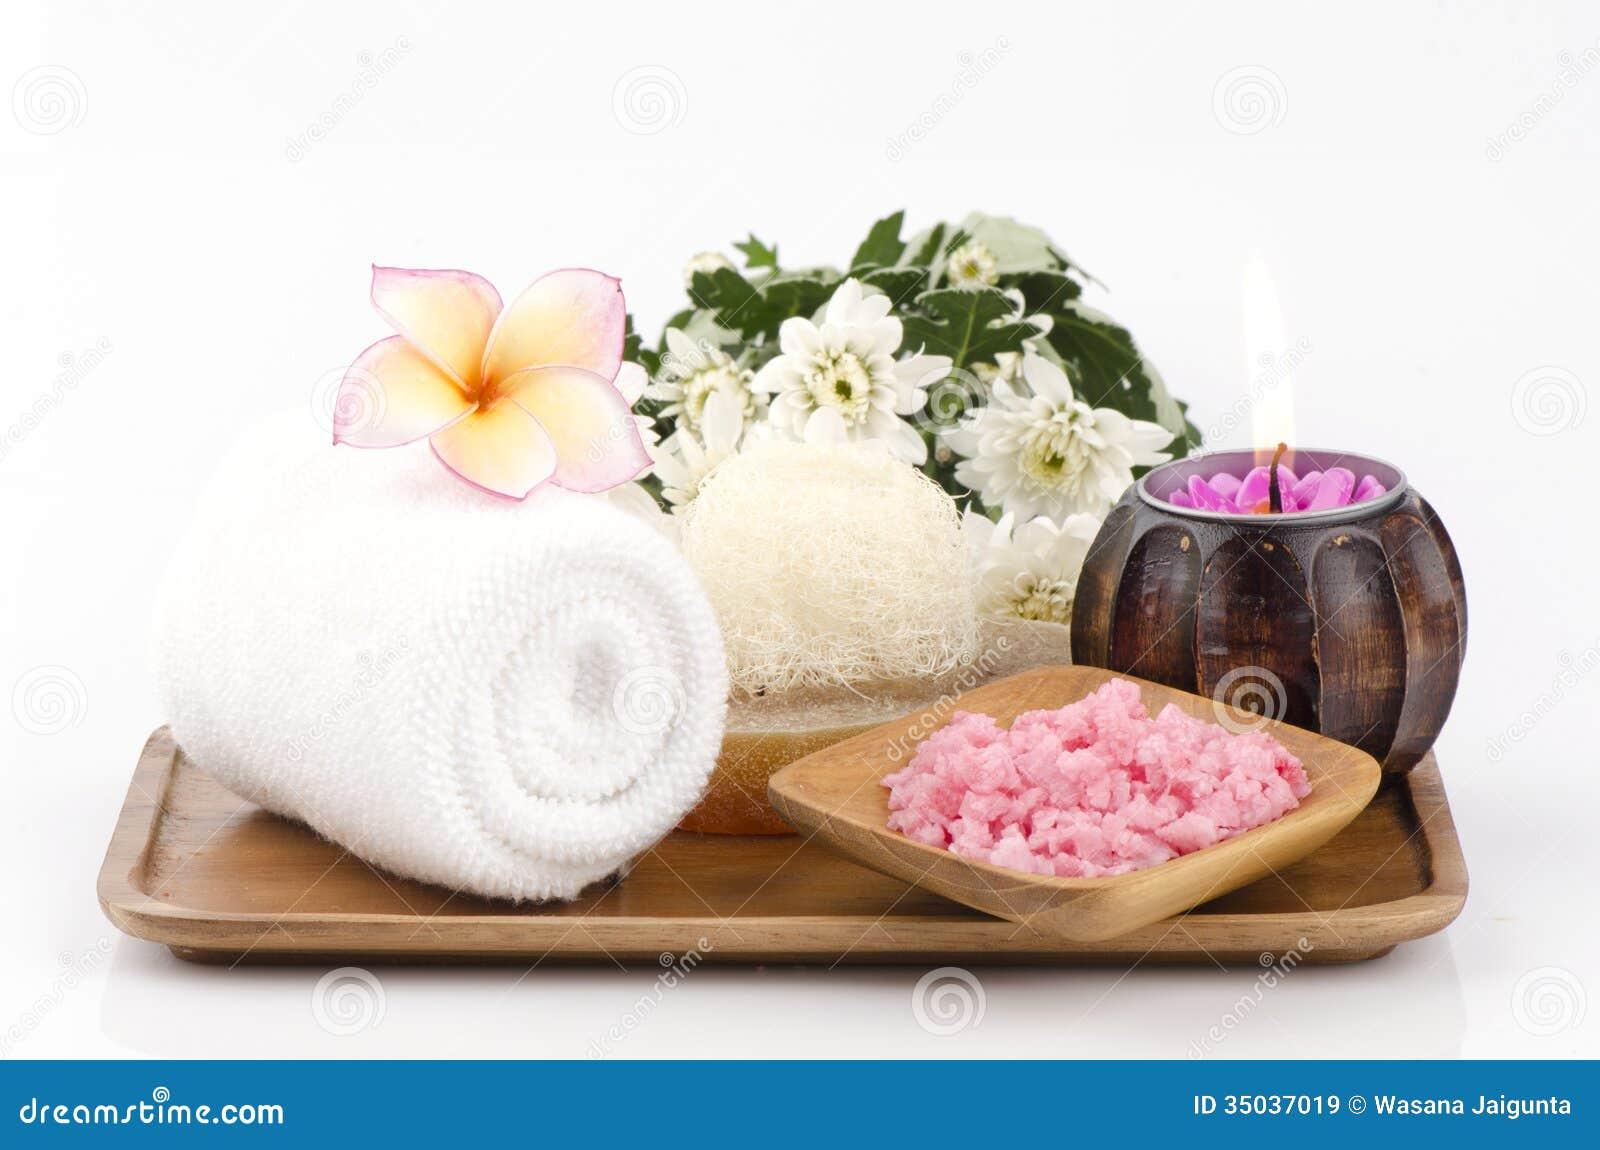 Spa treatment with sea salt stock image image 35037019 for Image salon